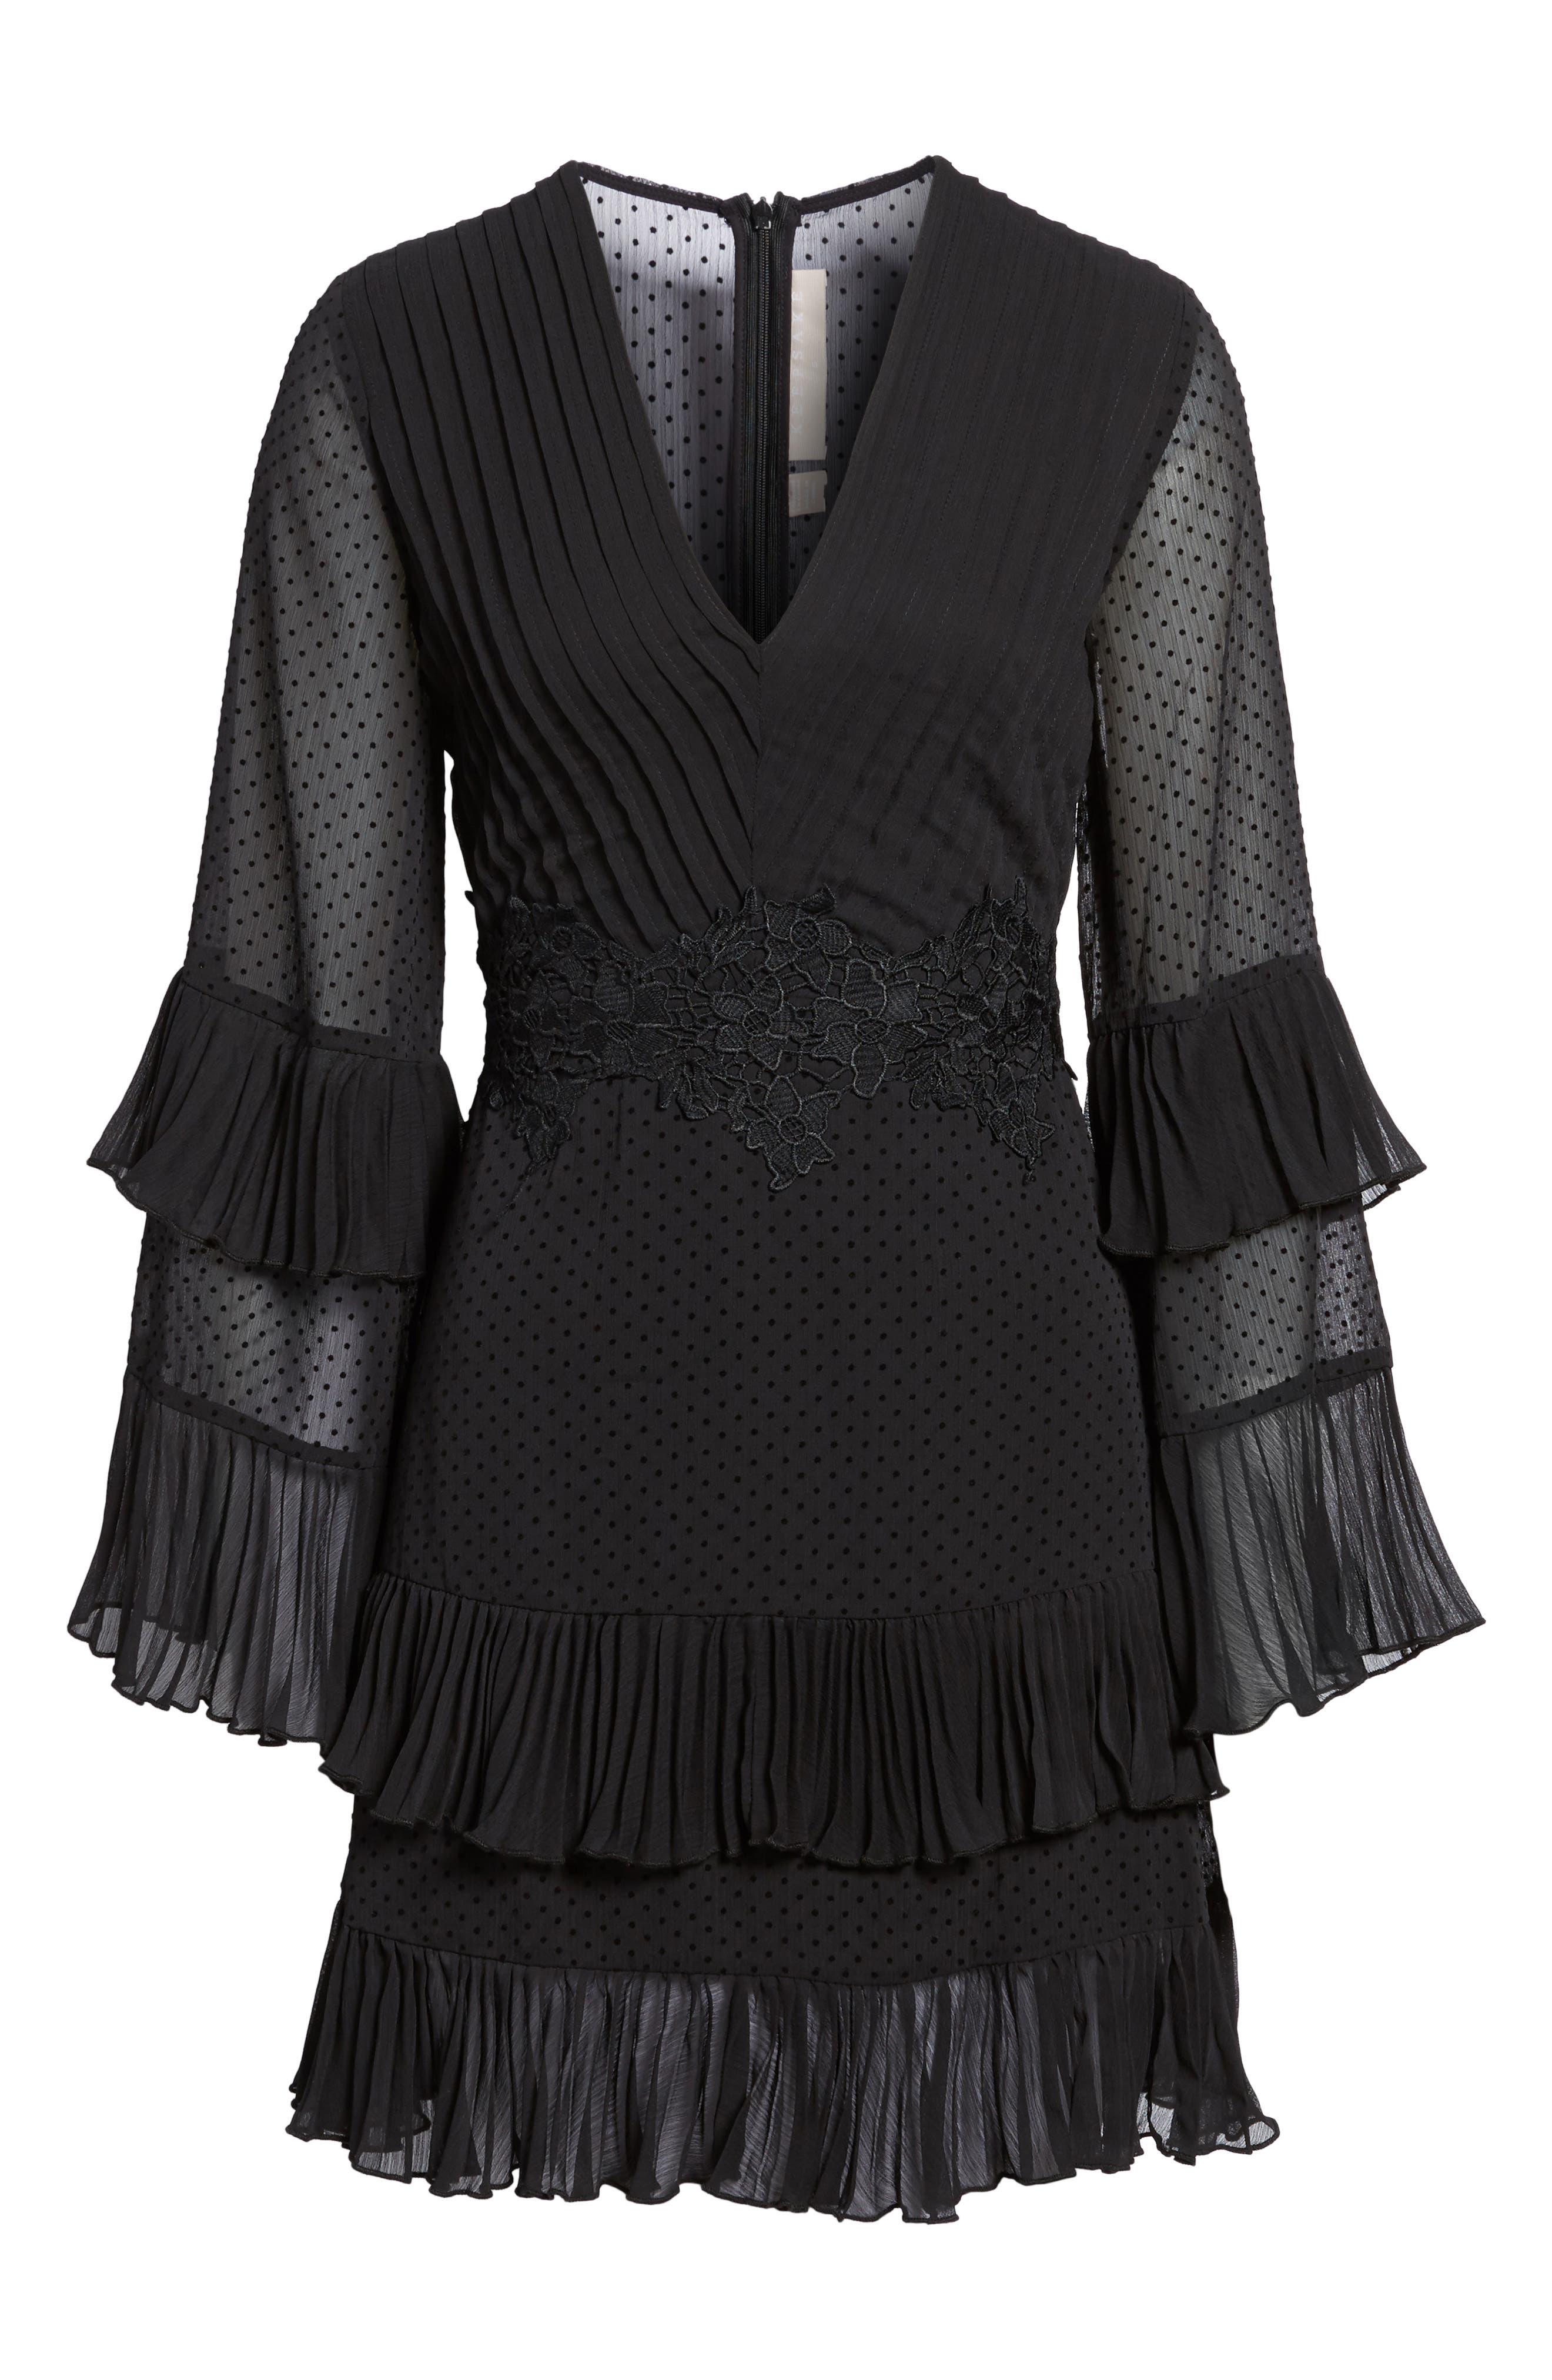 Horizons Bell Sleeve Minidress,                             Alternate thumbnail 7, color,                             Black